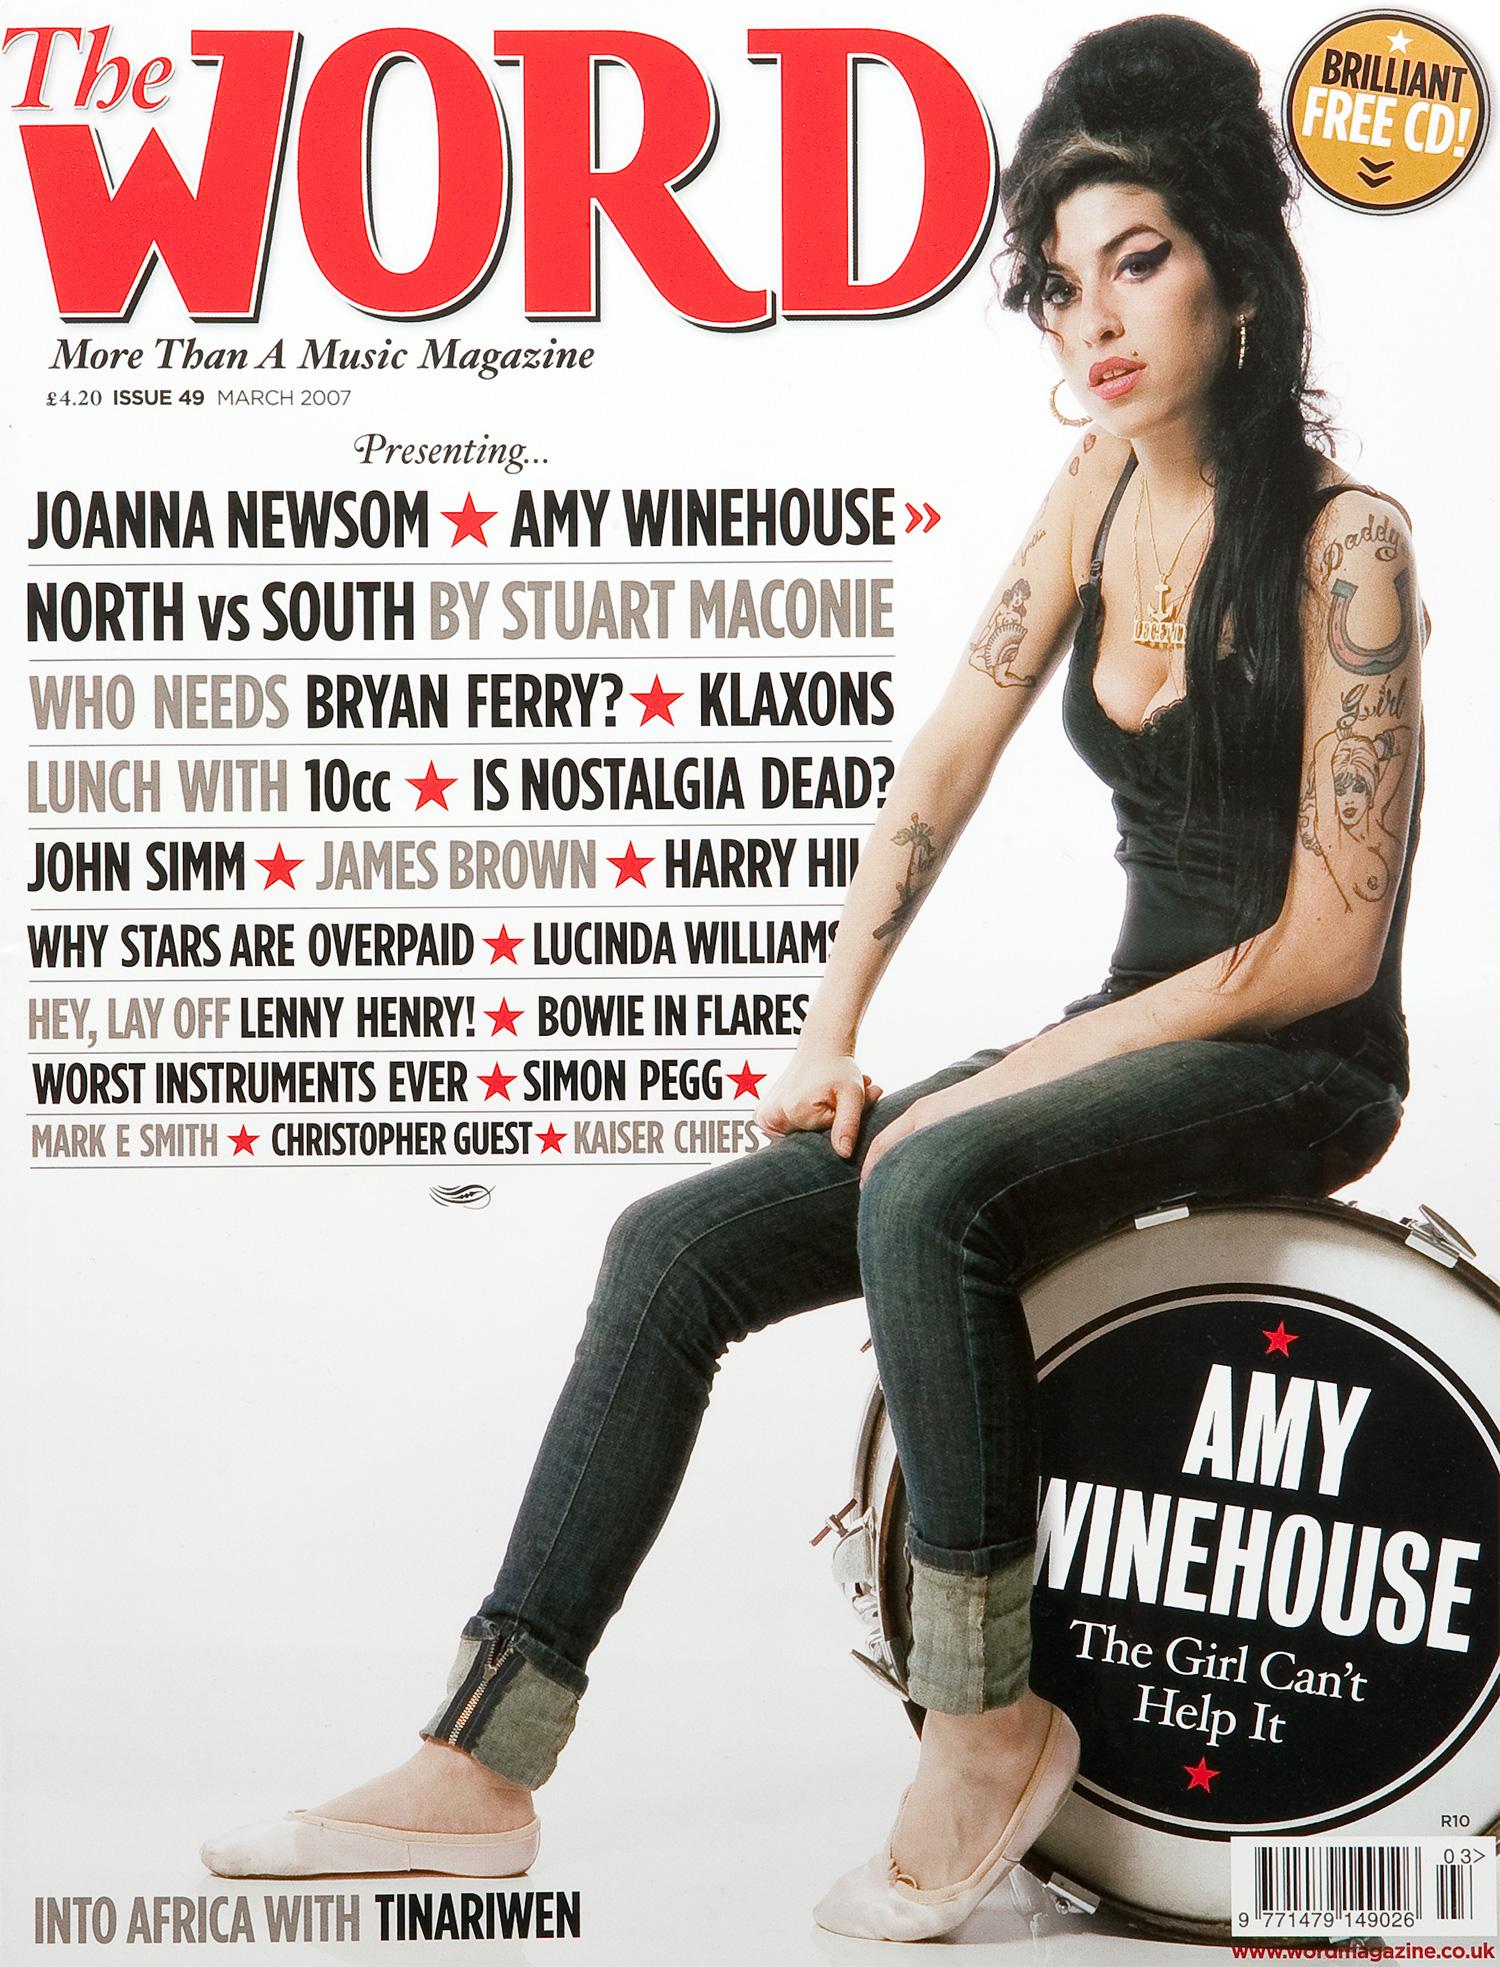 Amy Winehouse, The Word Magazine.